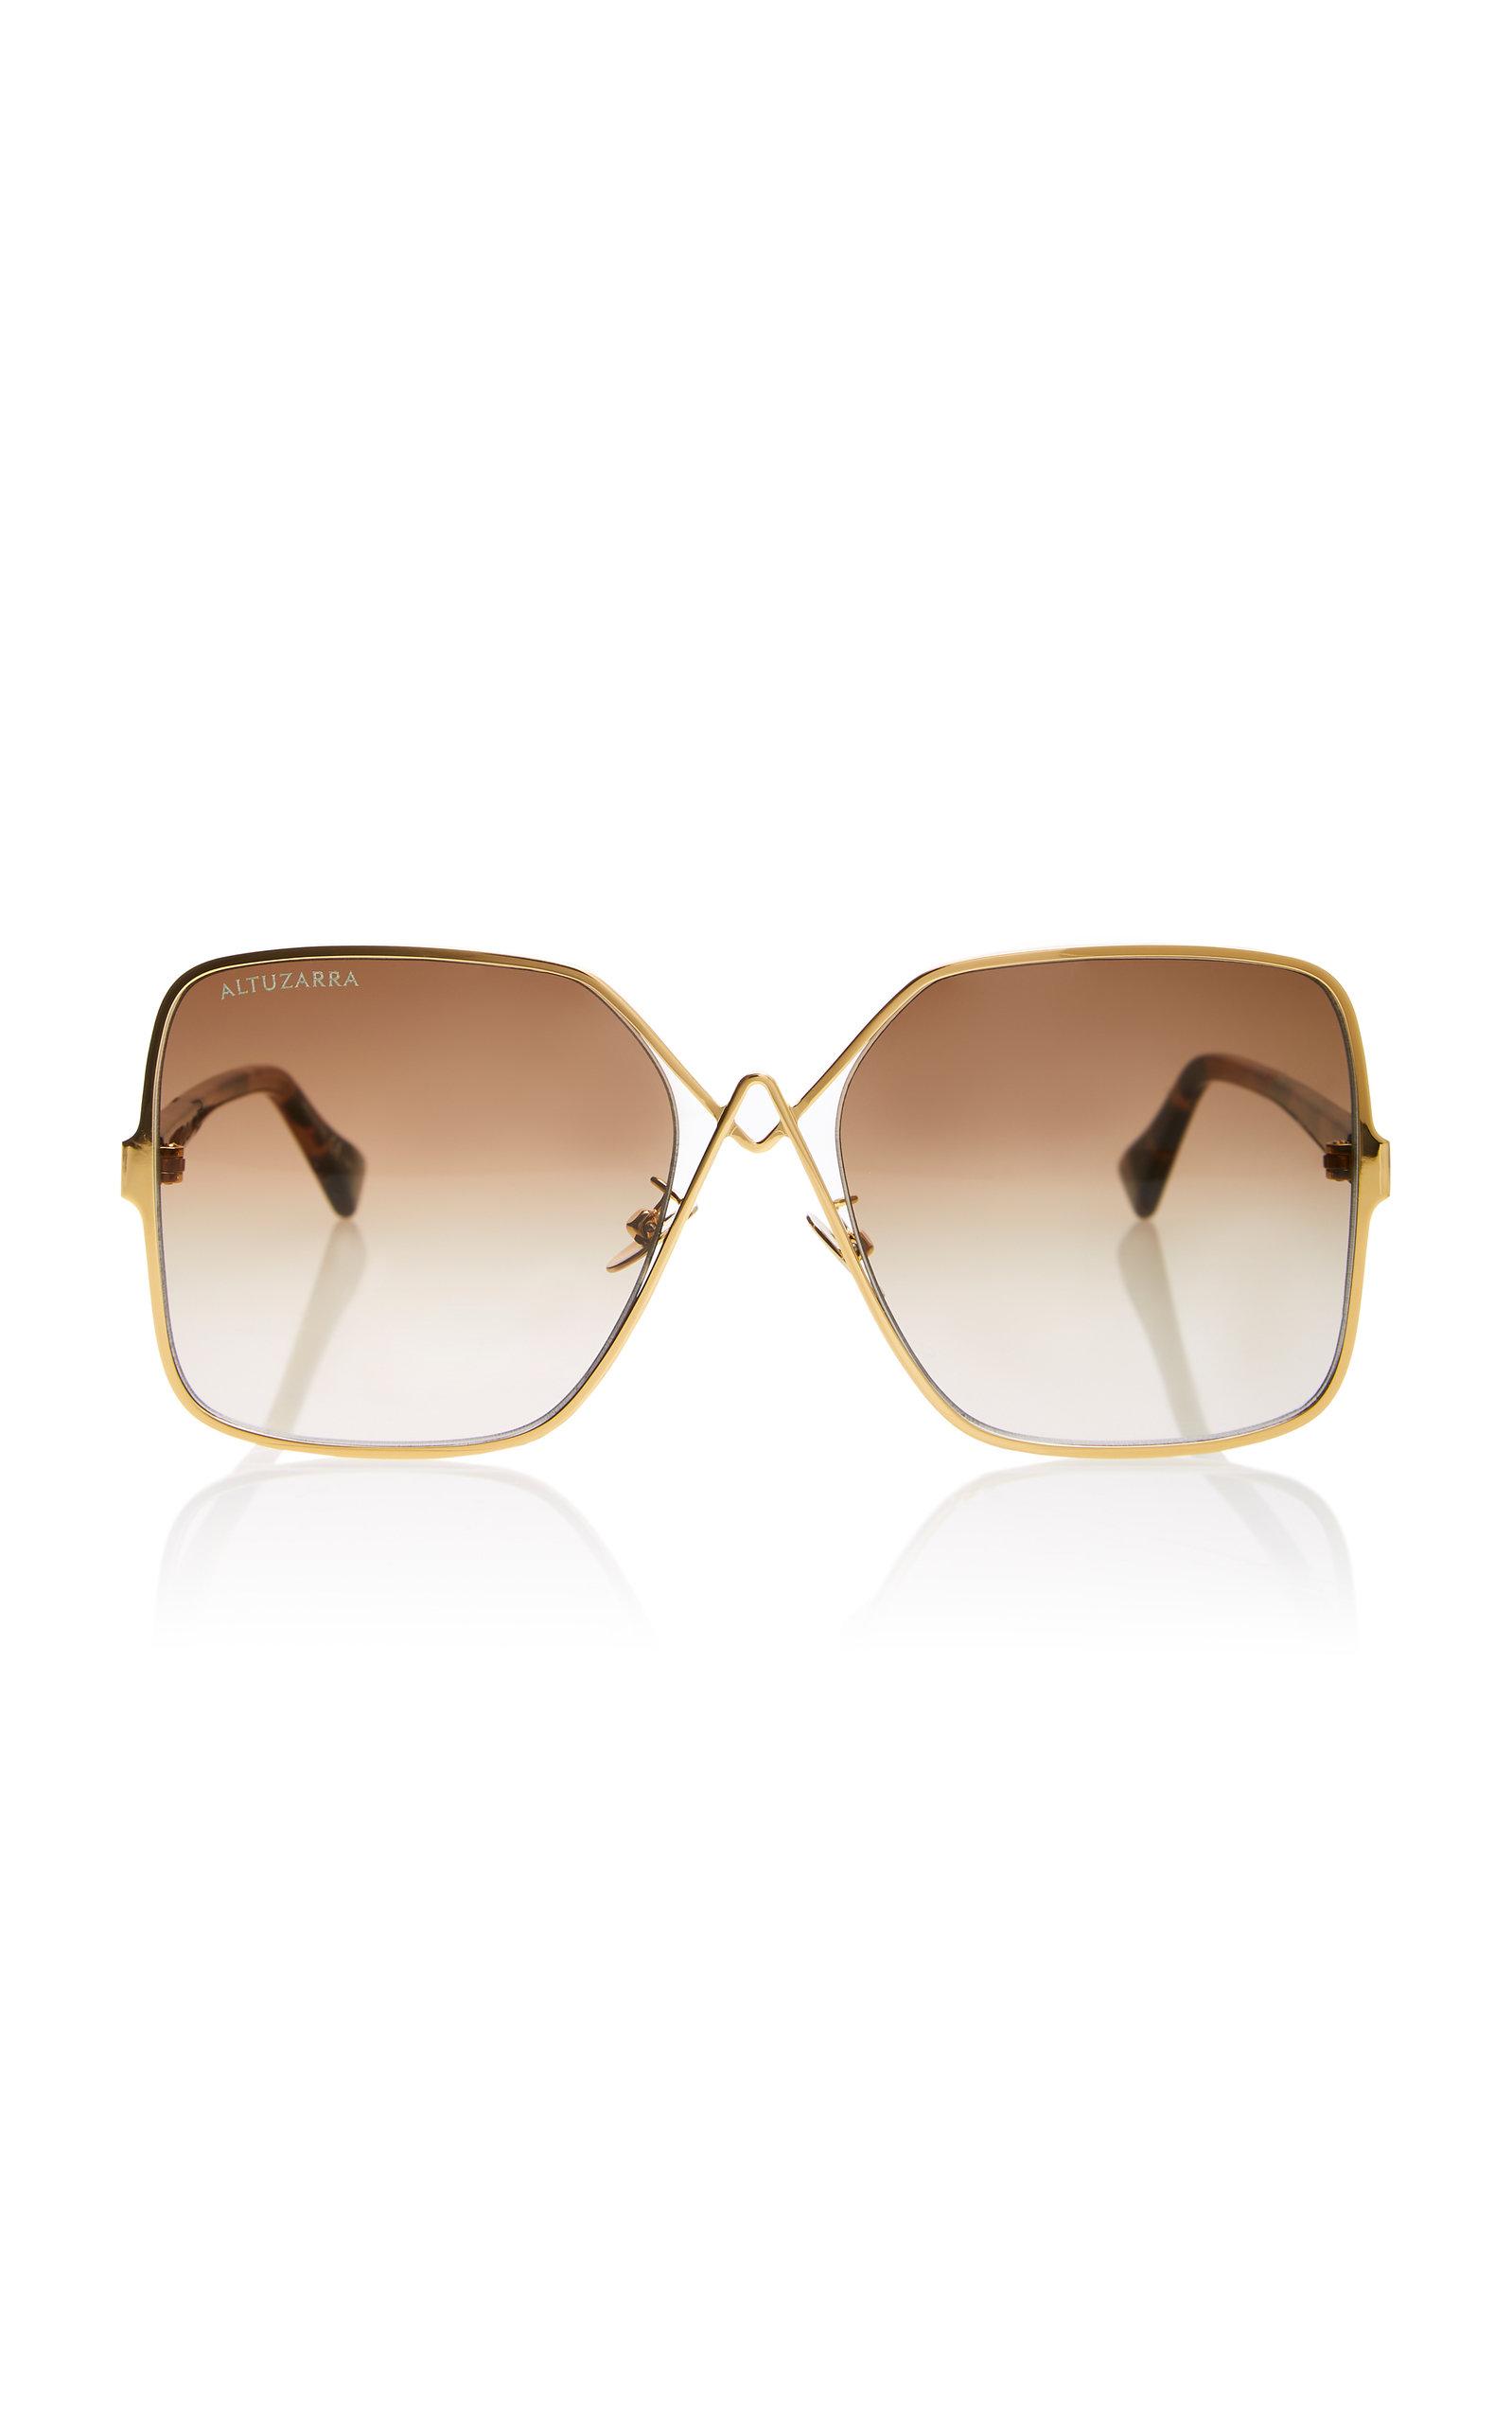 ALTUZARRA SUNGLASSES Oversized Square Sunglasses in Gold